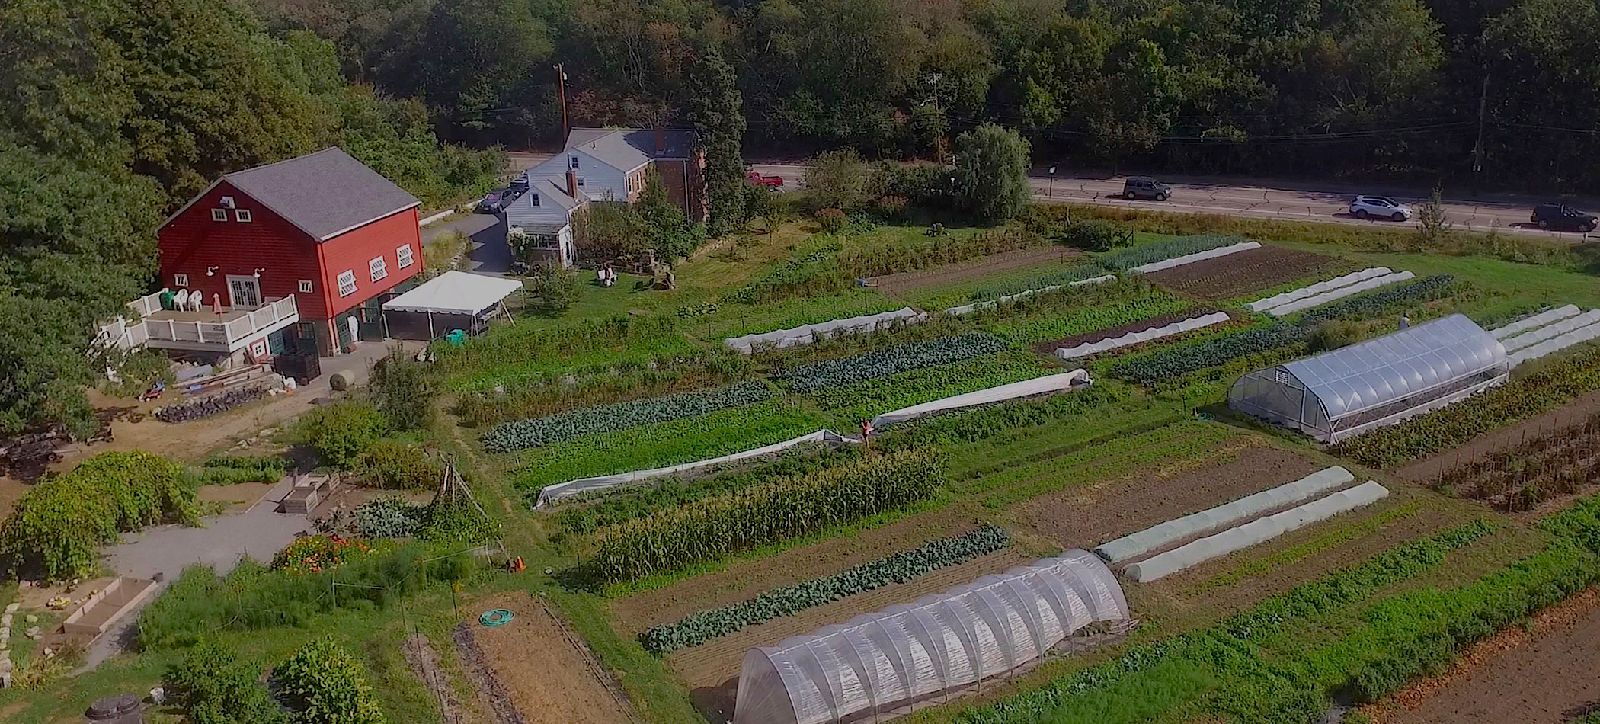 farm_aerial_10_17.jpg